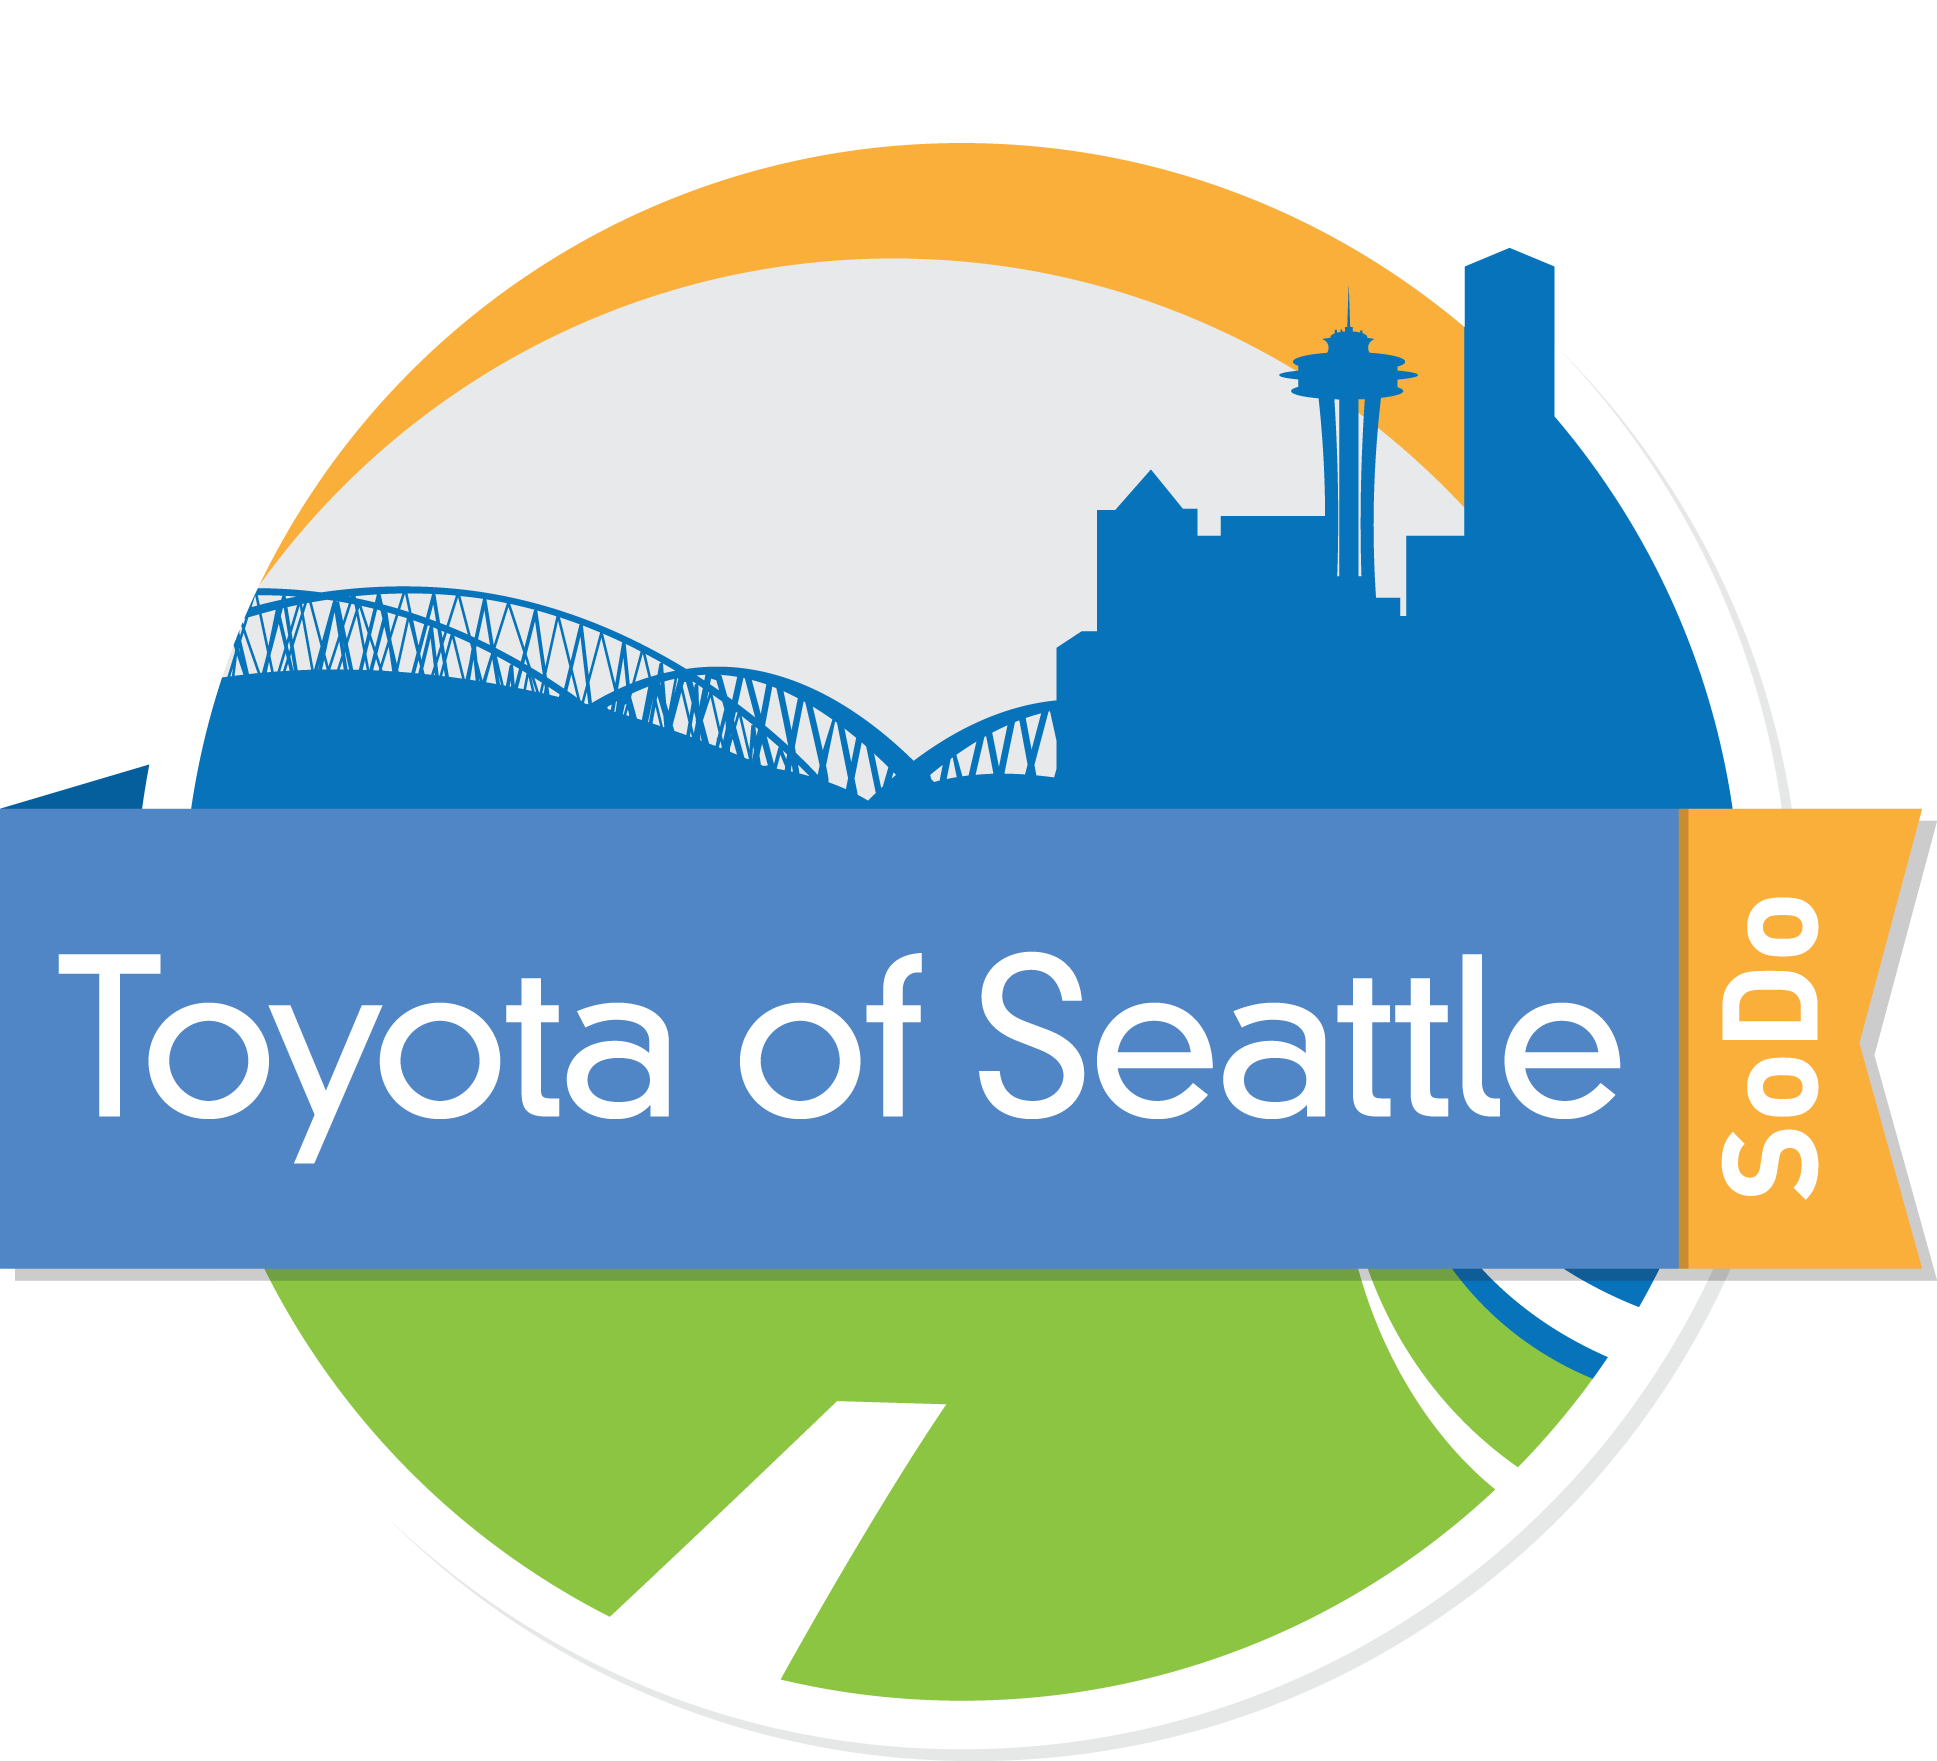 Toyota of Seattle Staff - Seattle WA area Toyota dealer